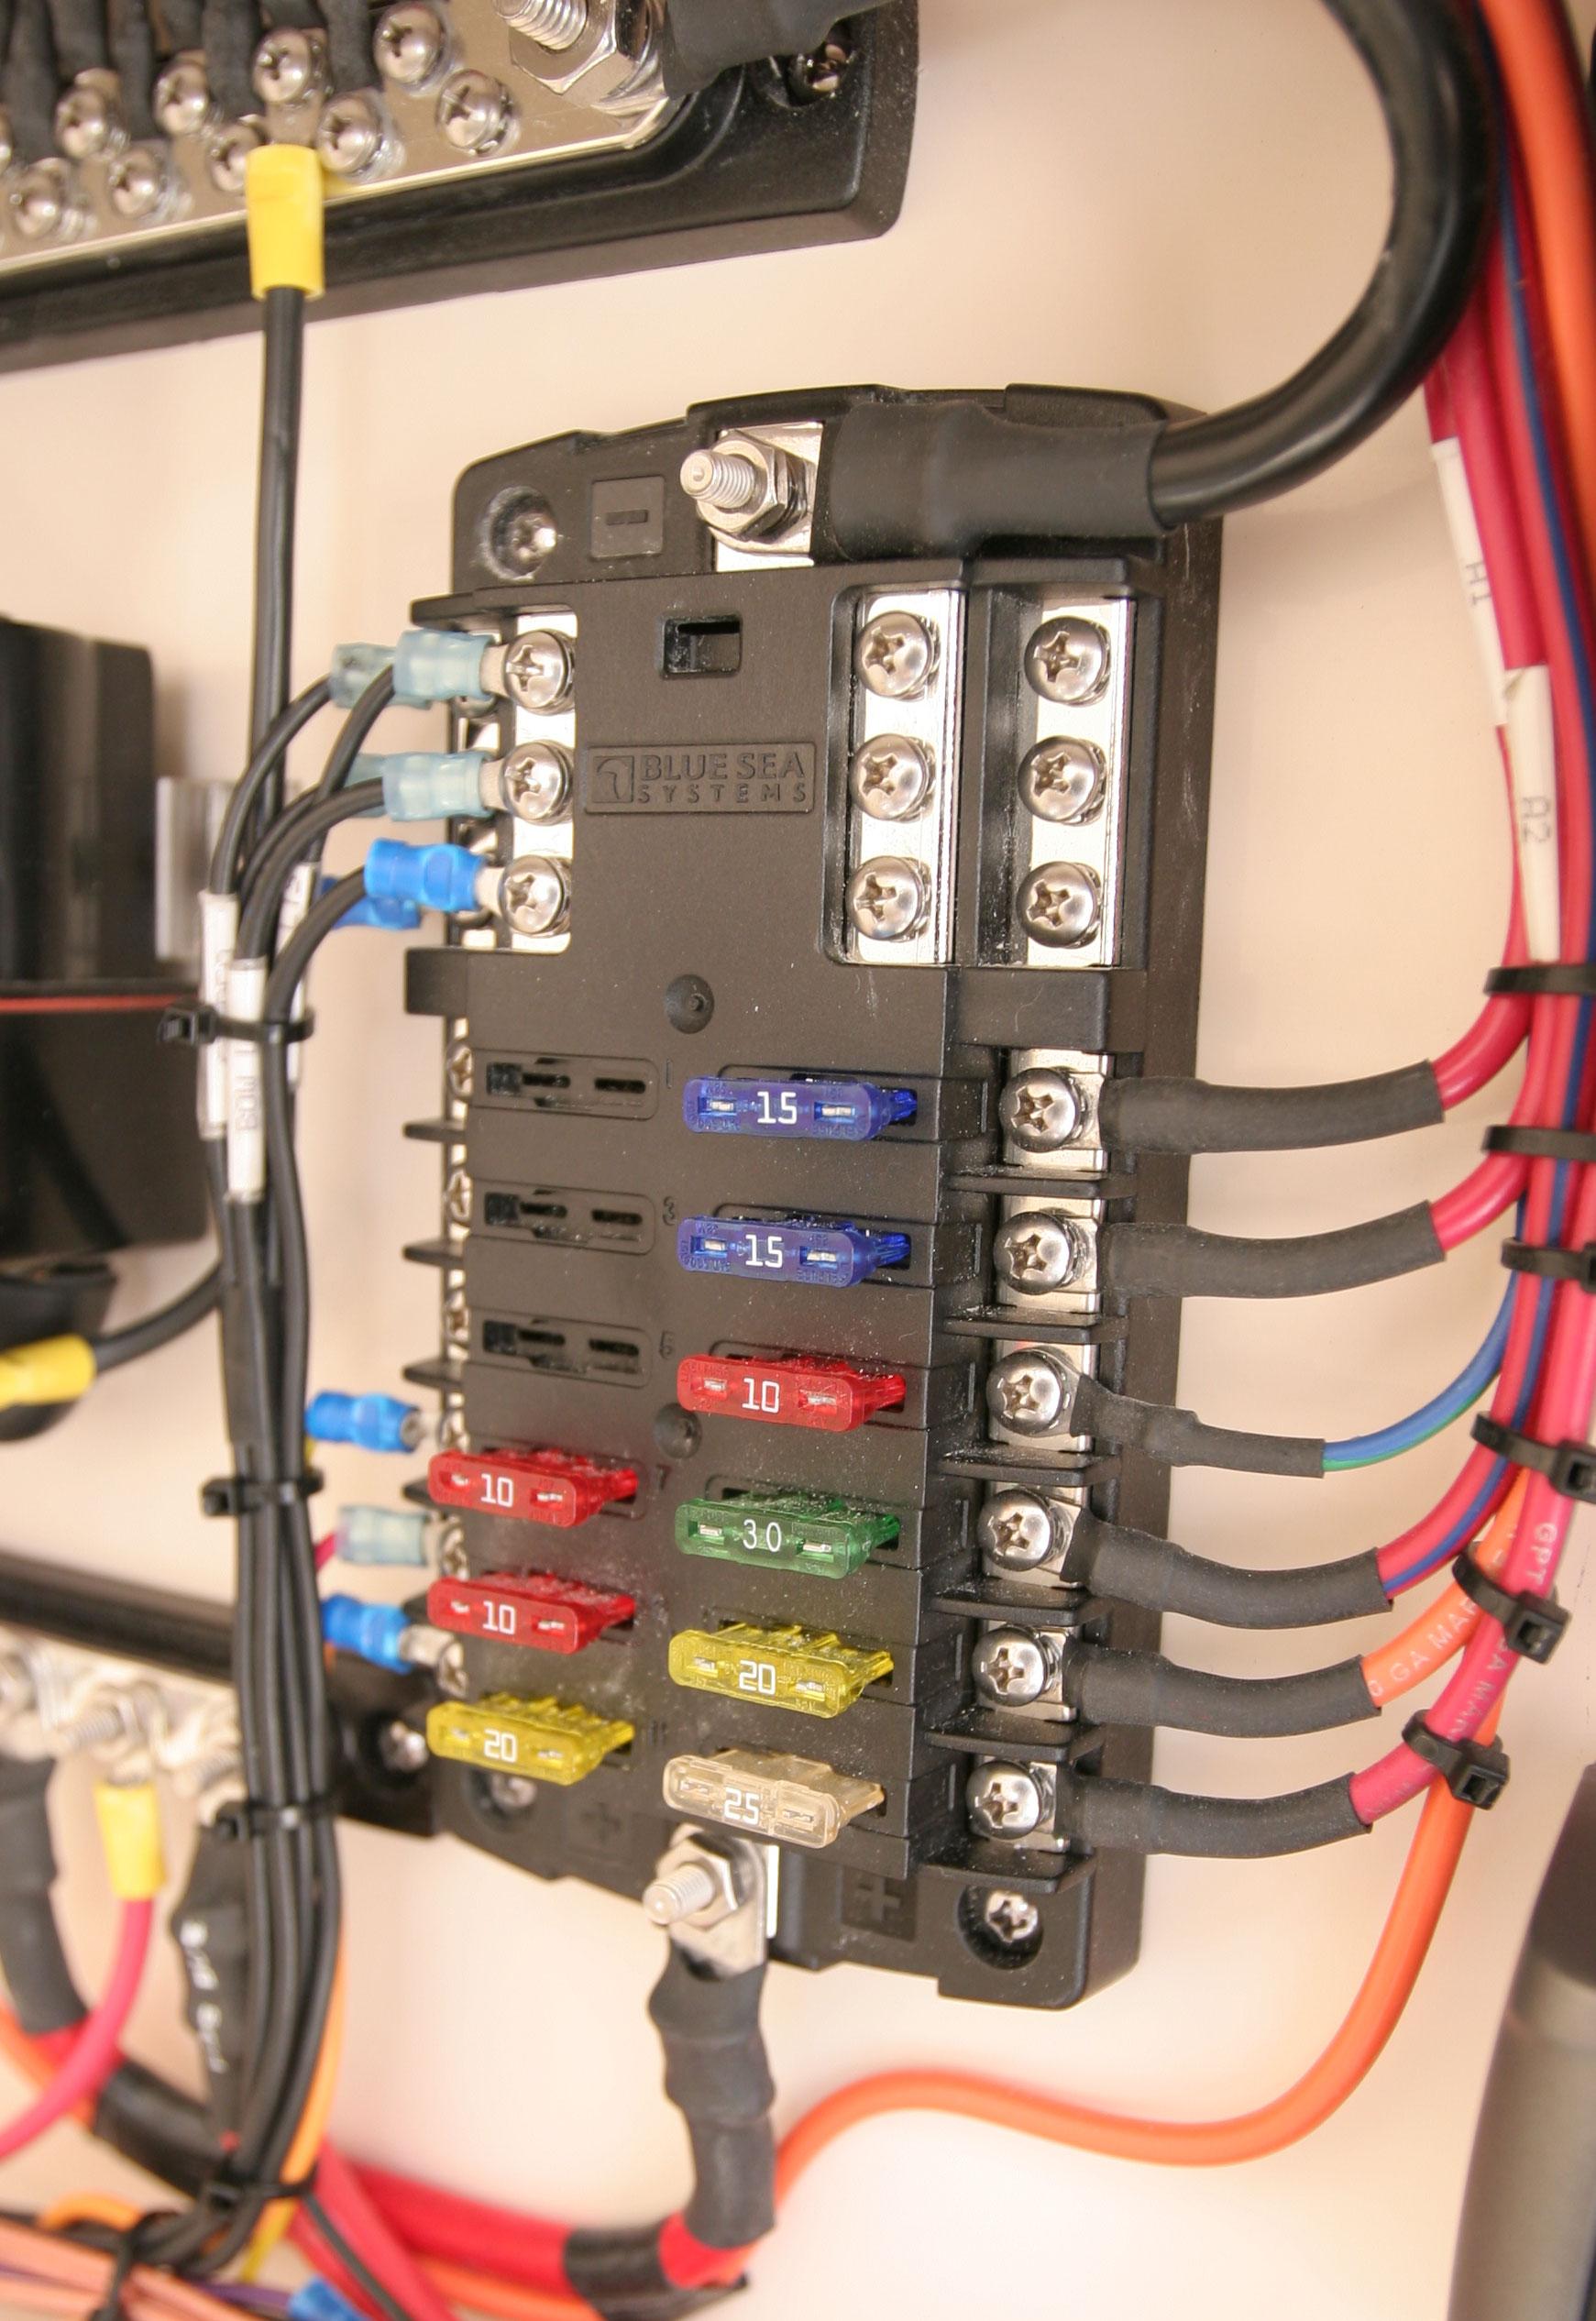 [SCHEMATICS_44OR]  Blue Sea Systems ATO Fuse Block 12 Circuits with Ground - 5026 – False  Creek Fuels | 12 Fuse Box |  | False Creek Fuels